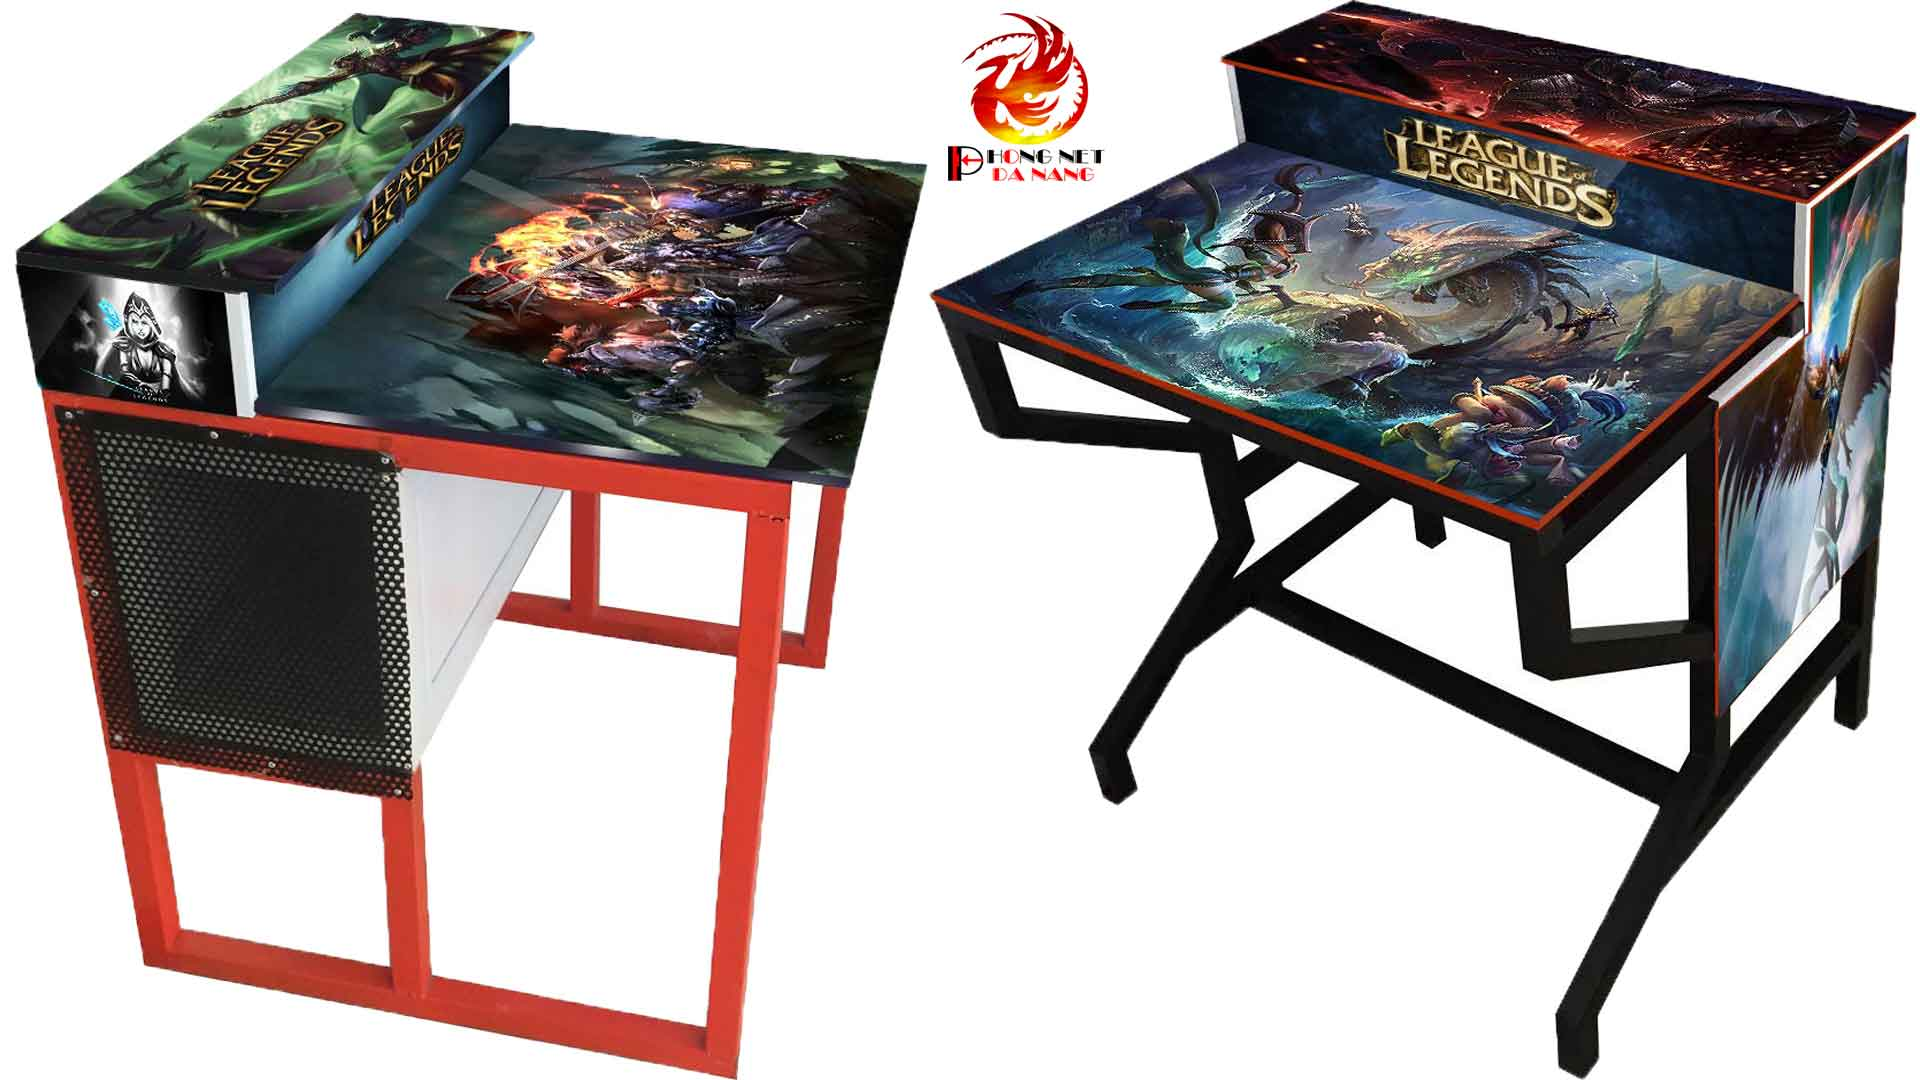 lap-dat-phong-game-net-50-may-tai-thanh-pho-da-nang-phongnetdanang.com-4